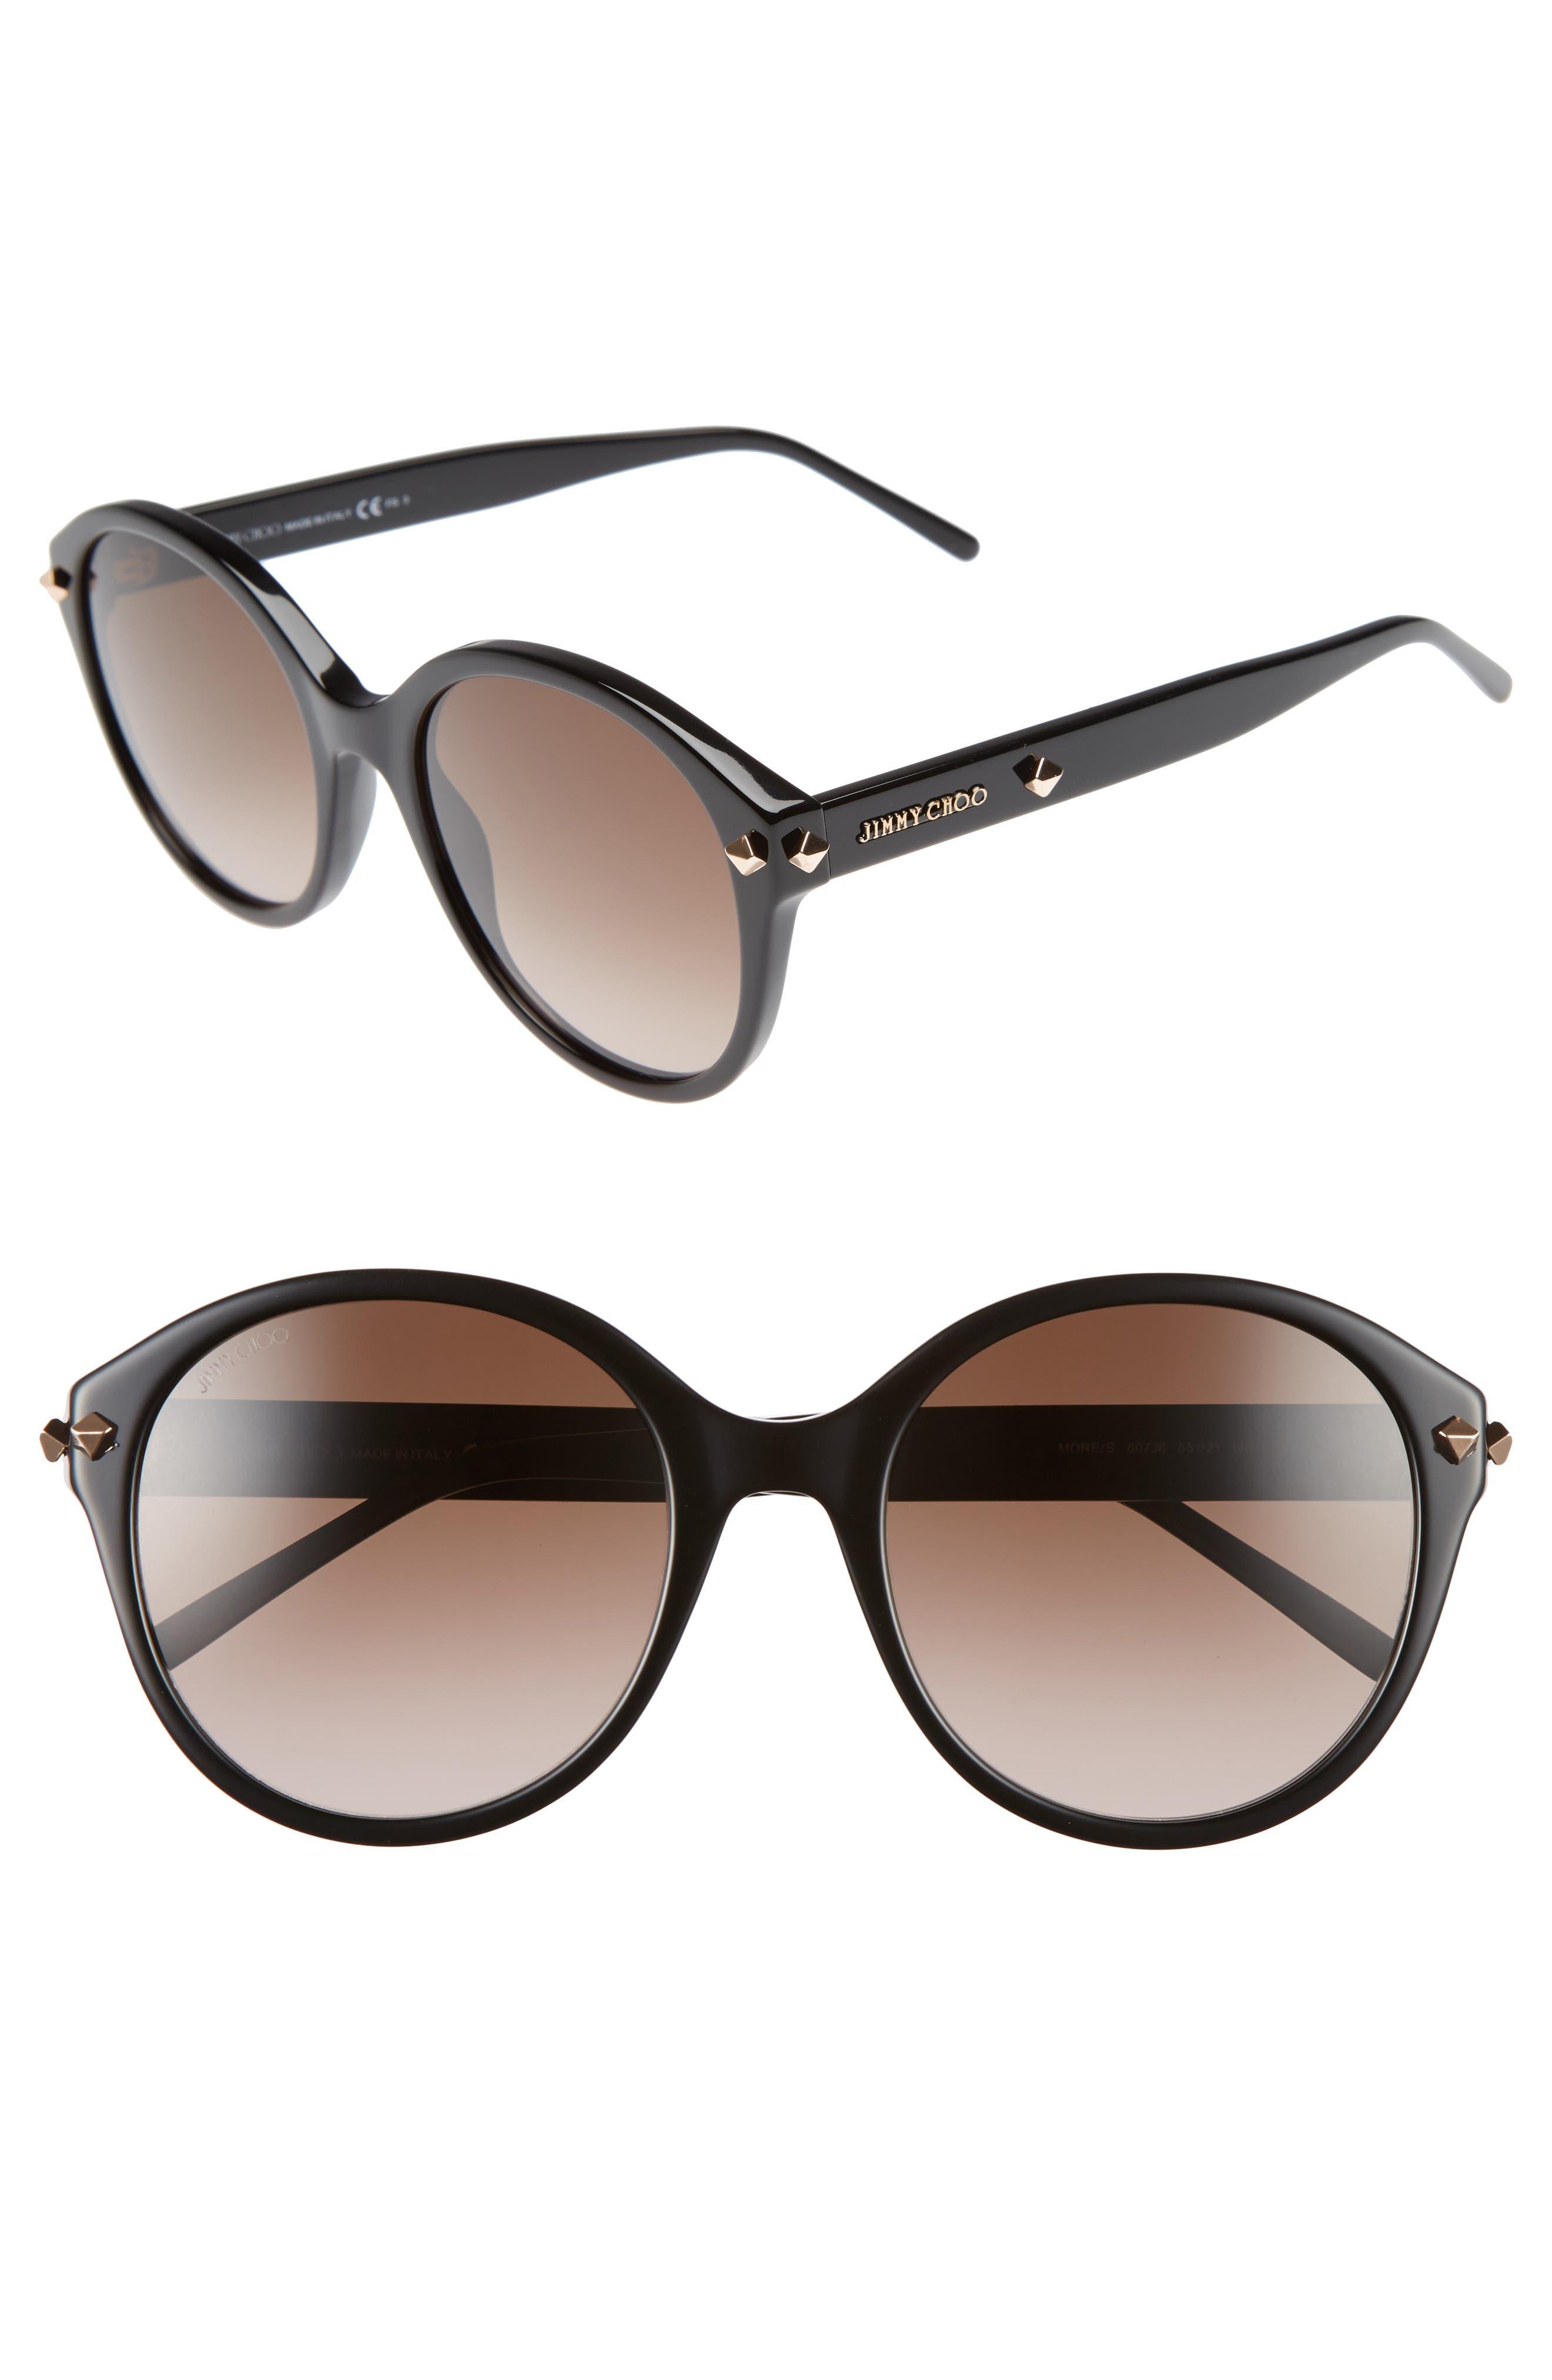 Main Image - Jimmy Choo 55mm Oversized Sunglasses